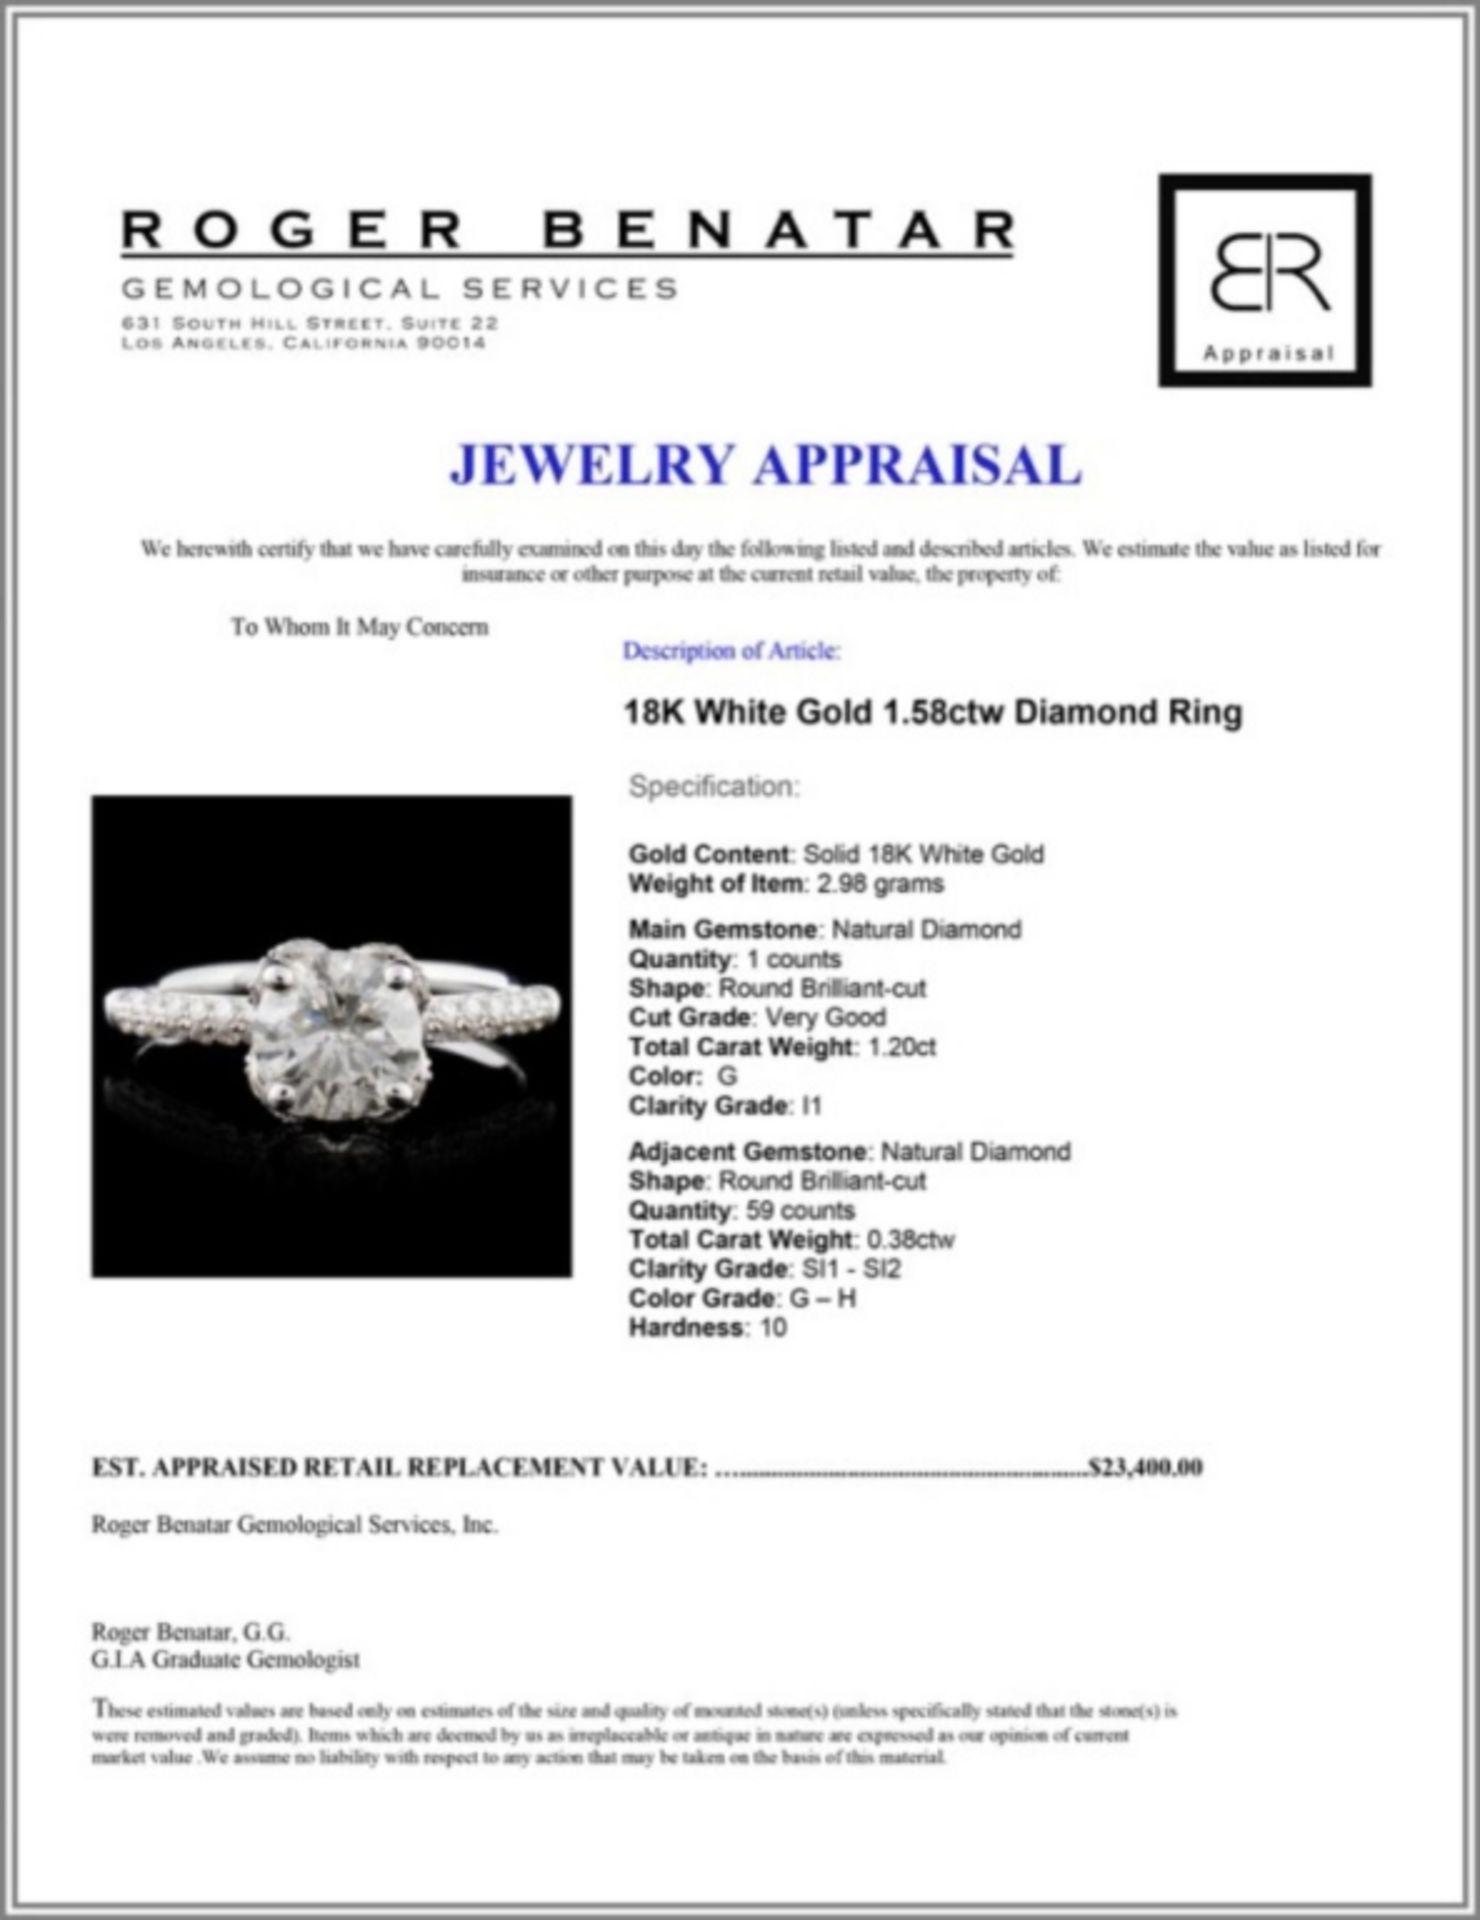 18K White Gold 1.58ctw Diamond Ring - Image 4 of 4